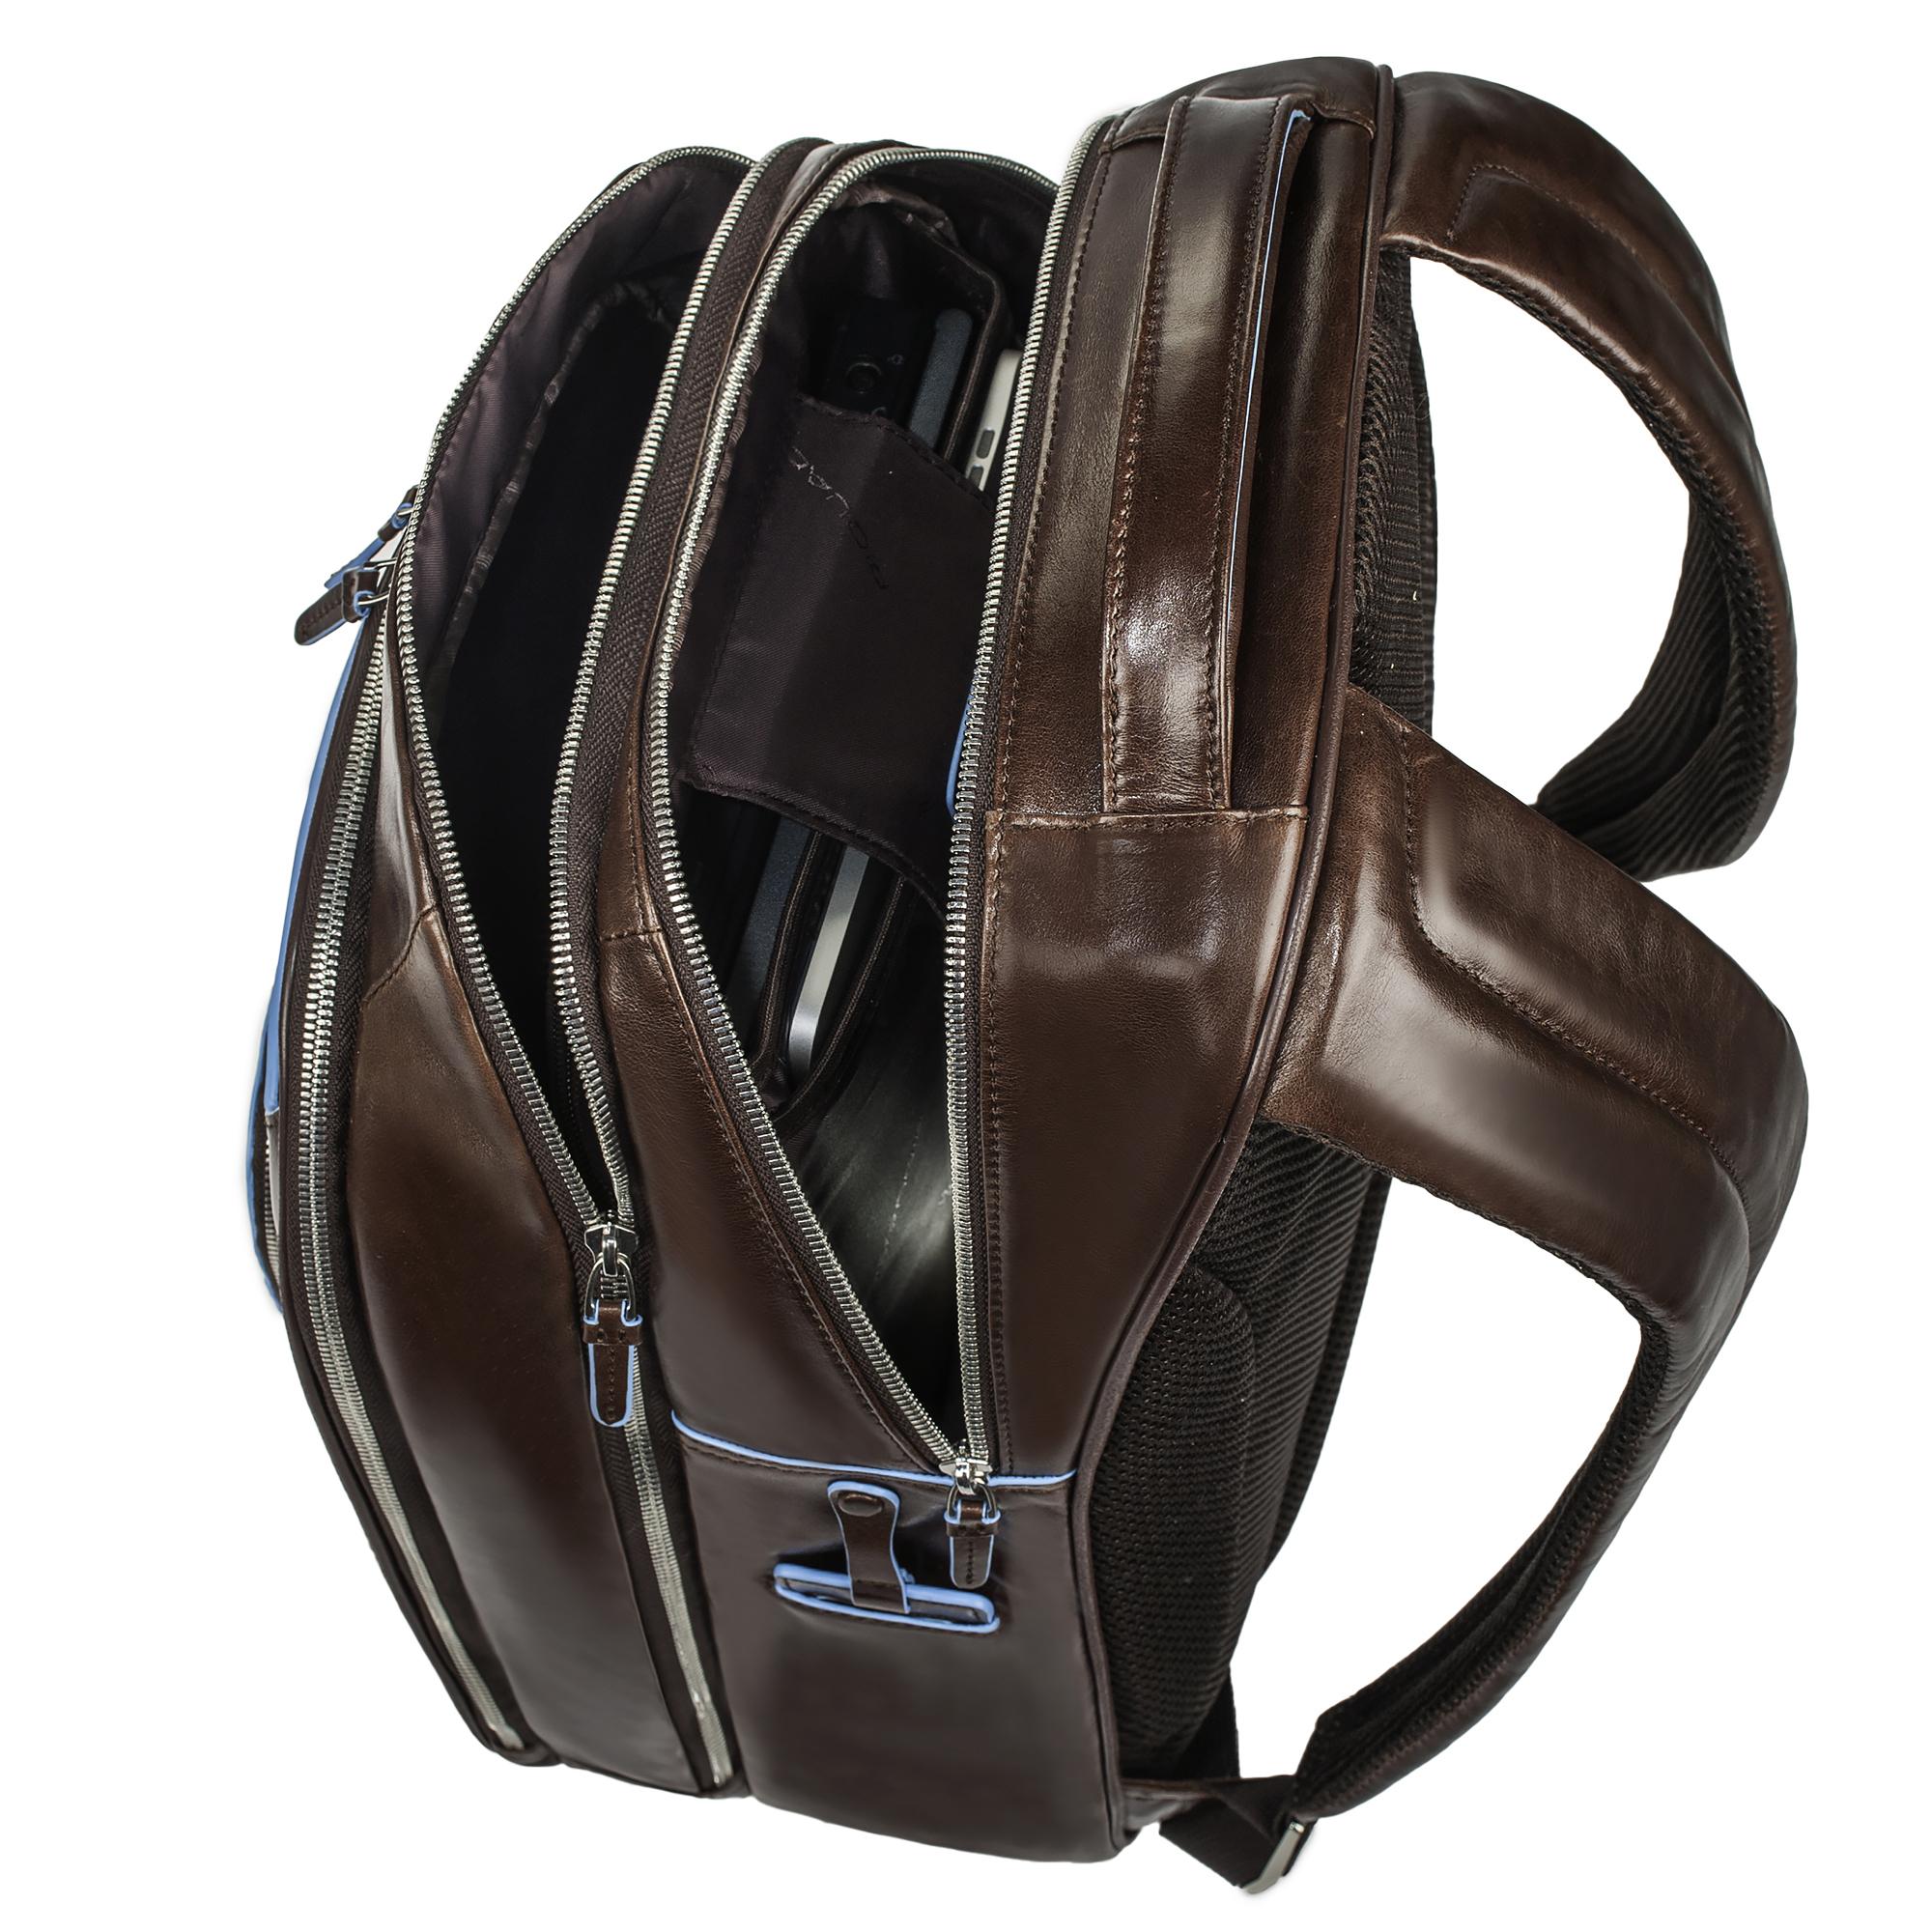 Рюкзак Piquadro Blue Square, цвет коричневый, 31х42х18,5 см (CA1813B2/MO)